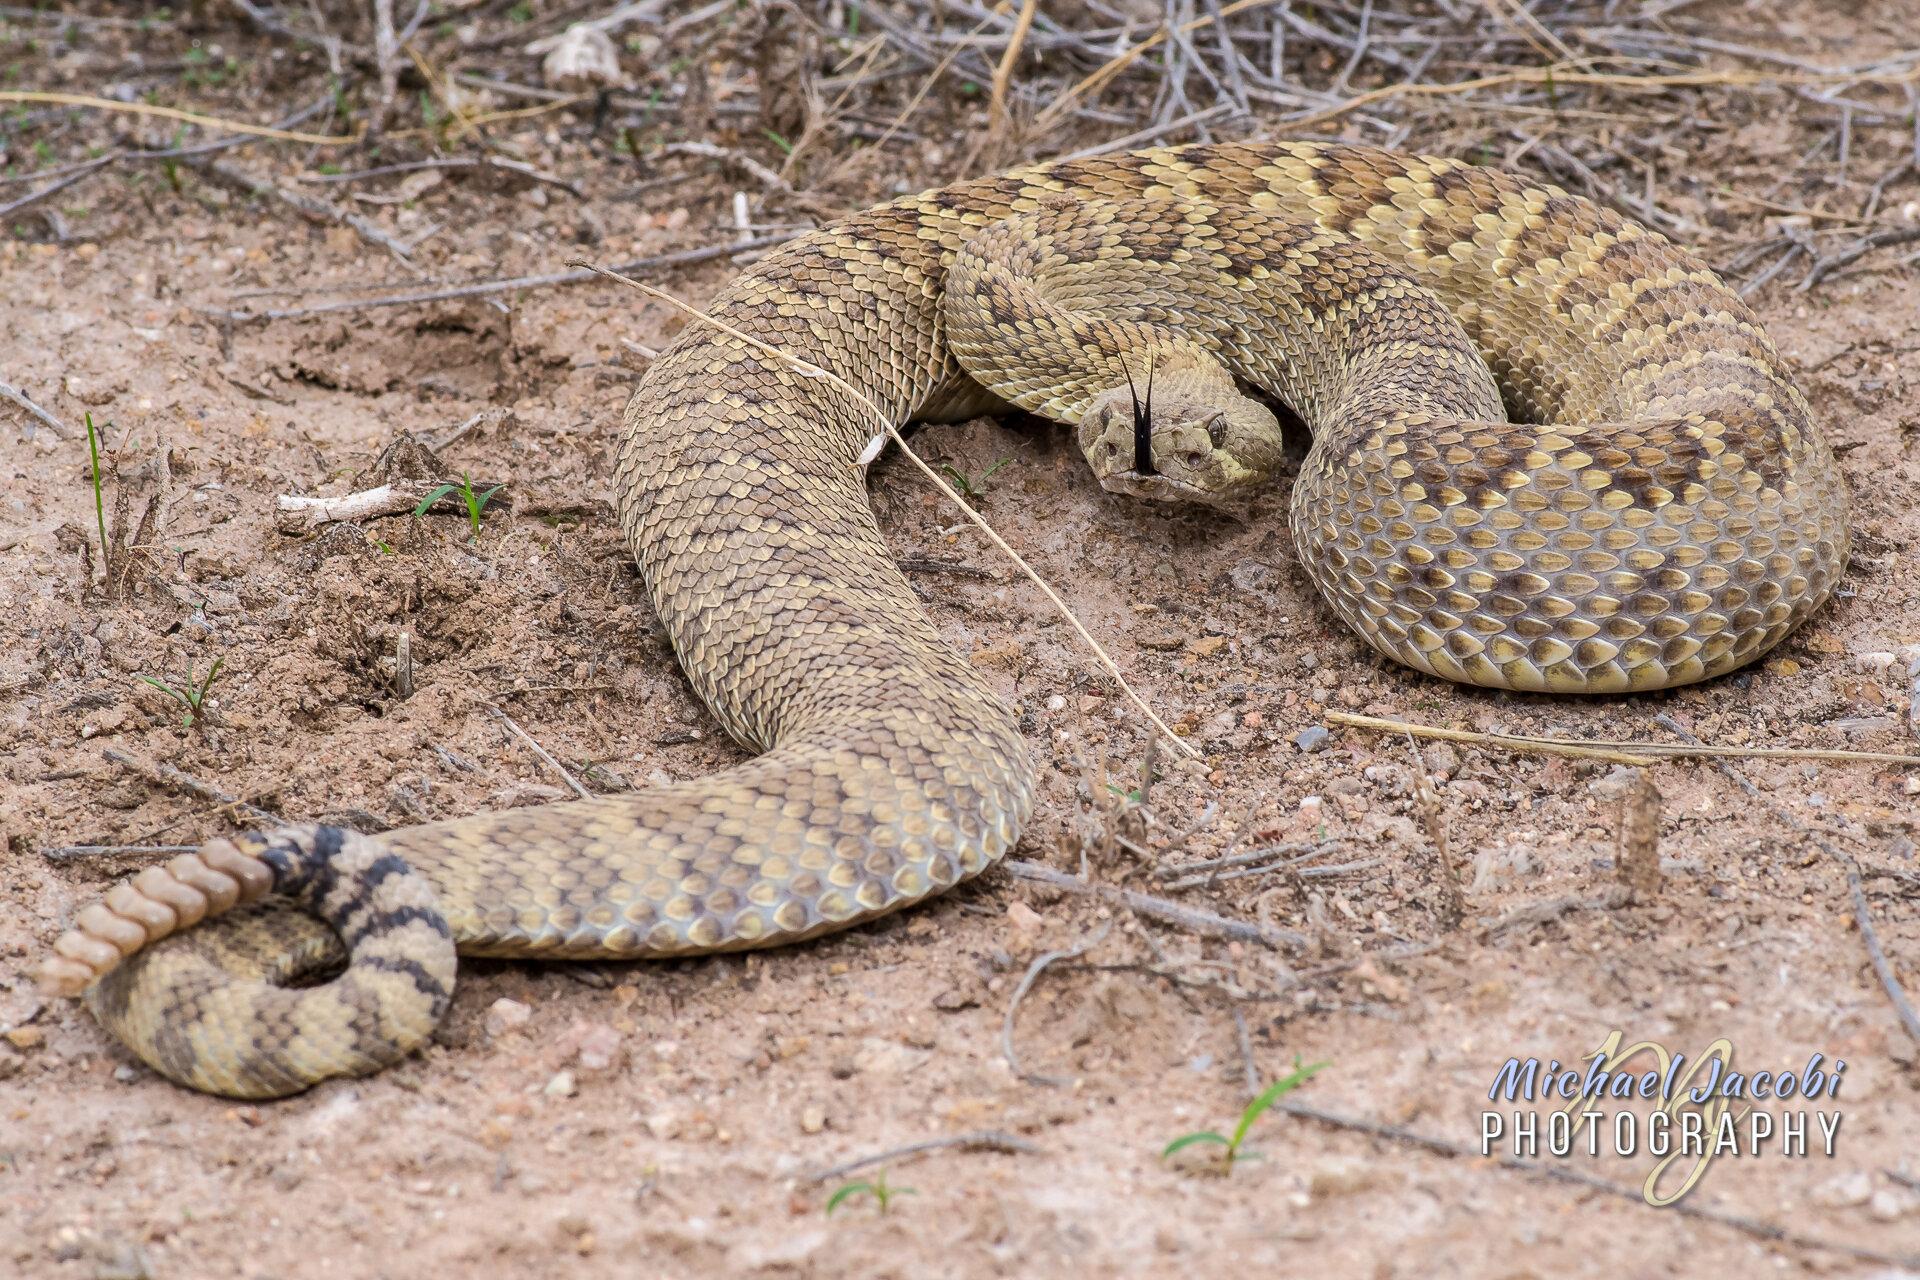 Mohave Rattlesnake ( Crotalus scutulatus ), Chiricahua Foothills